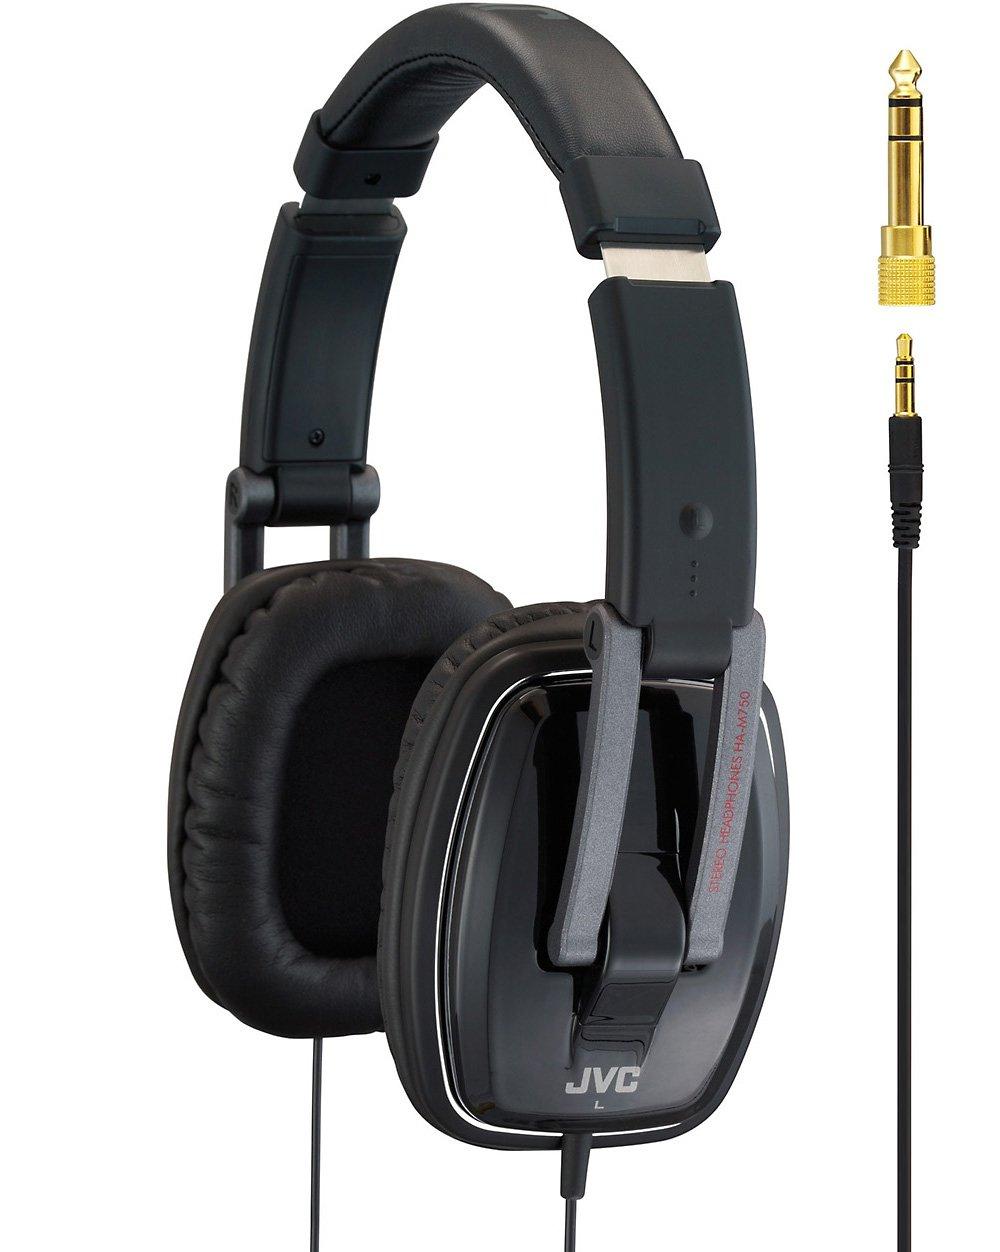 Jvc HAM750 Monitor Stereo DJ Style Headphones